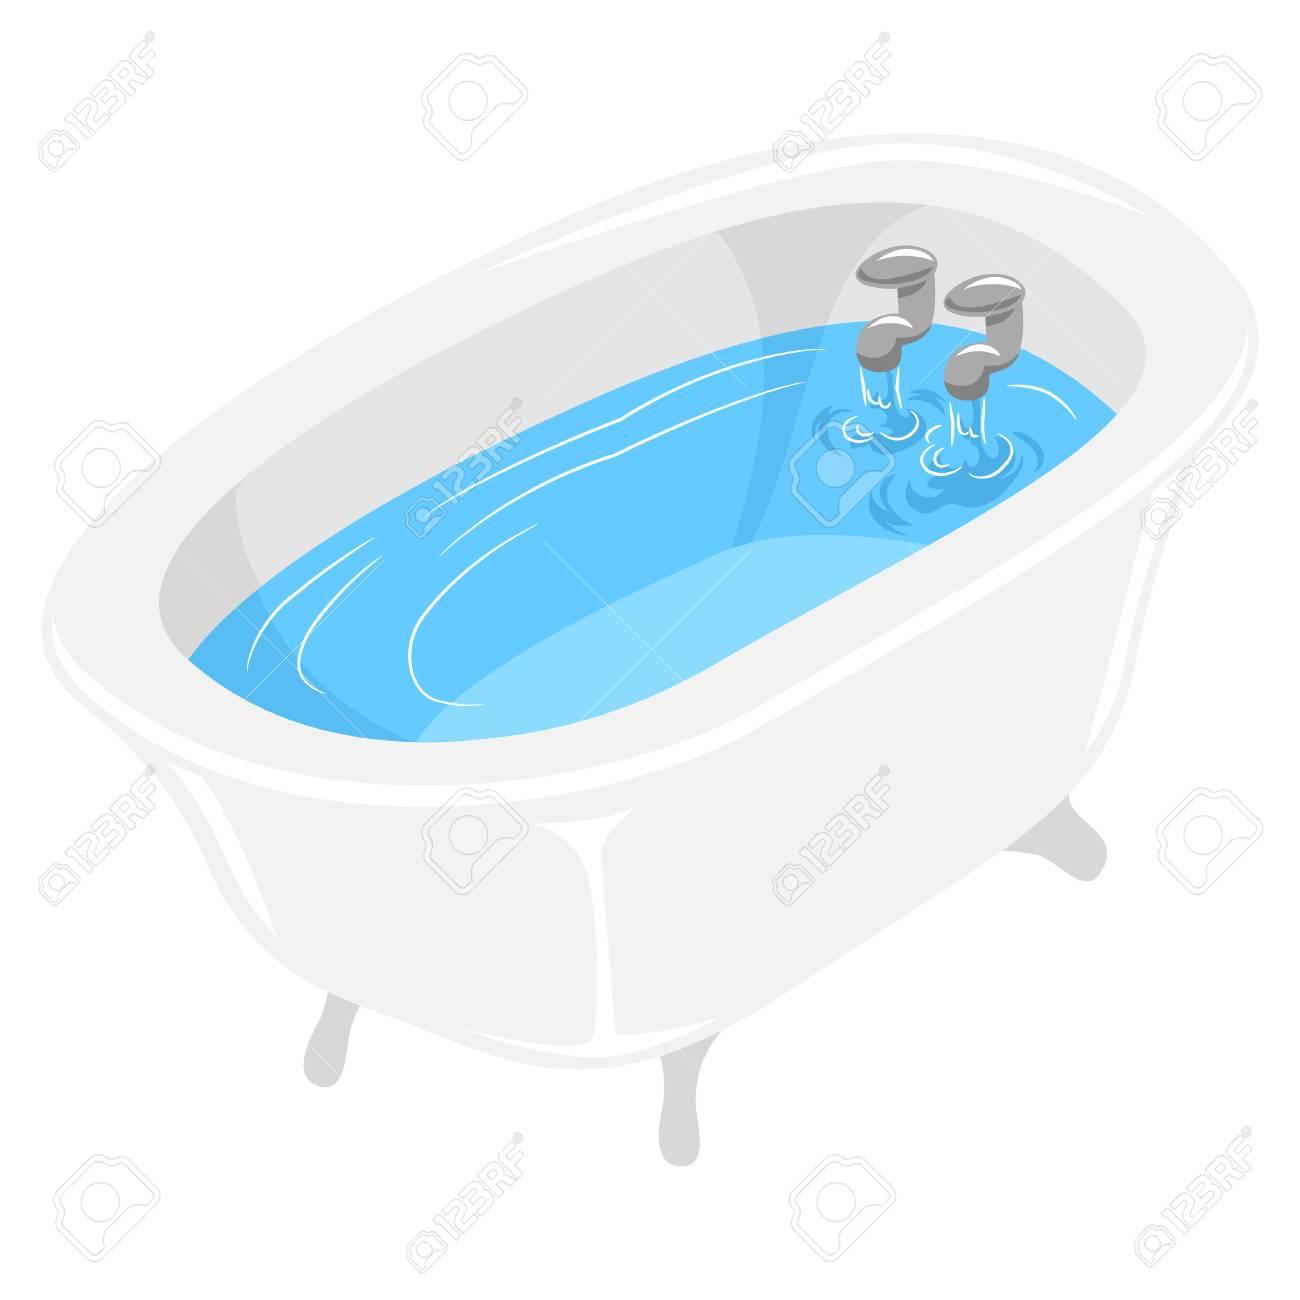 Free Bathtub Clipart tina, Download Free Clip Art on Owips.com